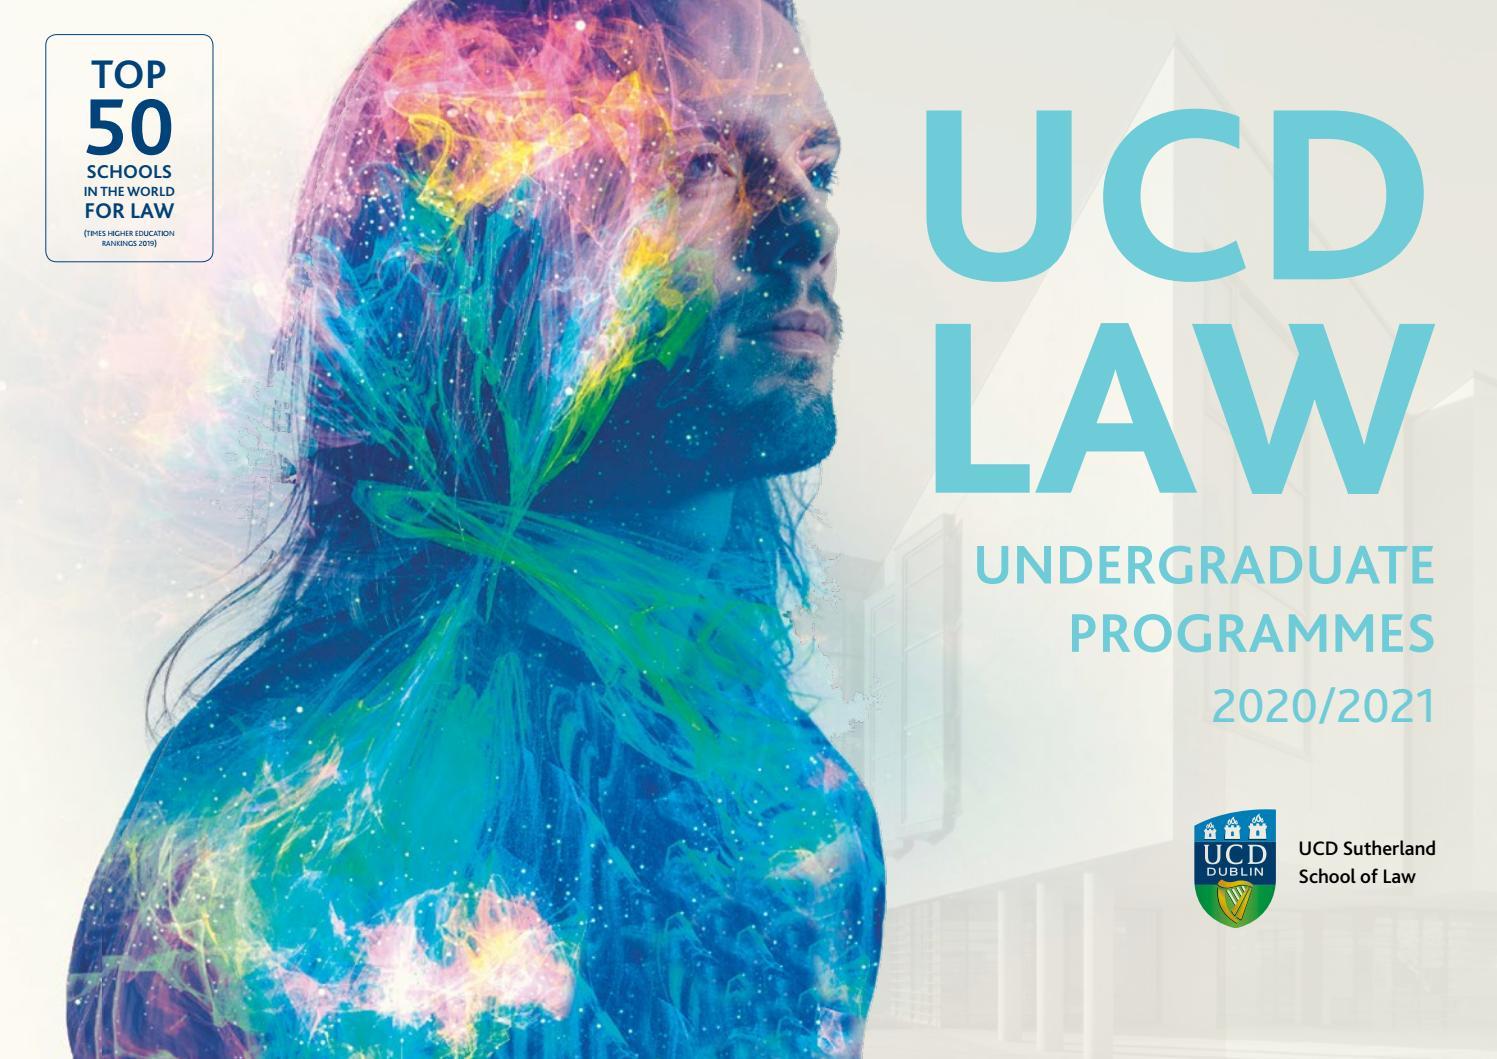 Rowan Graduation 2020.Ucd Law Graduate Programmes 2020 2021 By Advantage Point Issuu